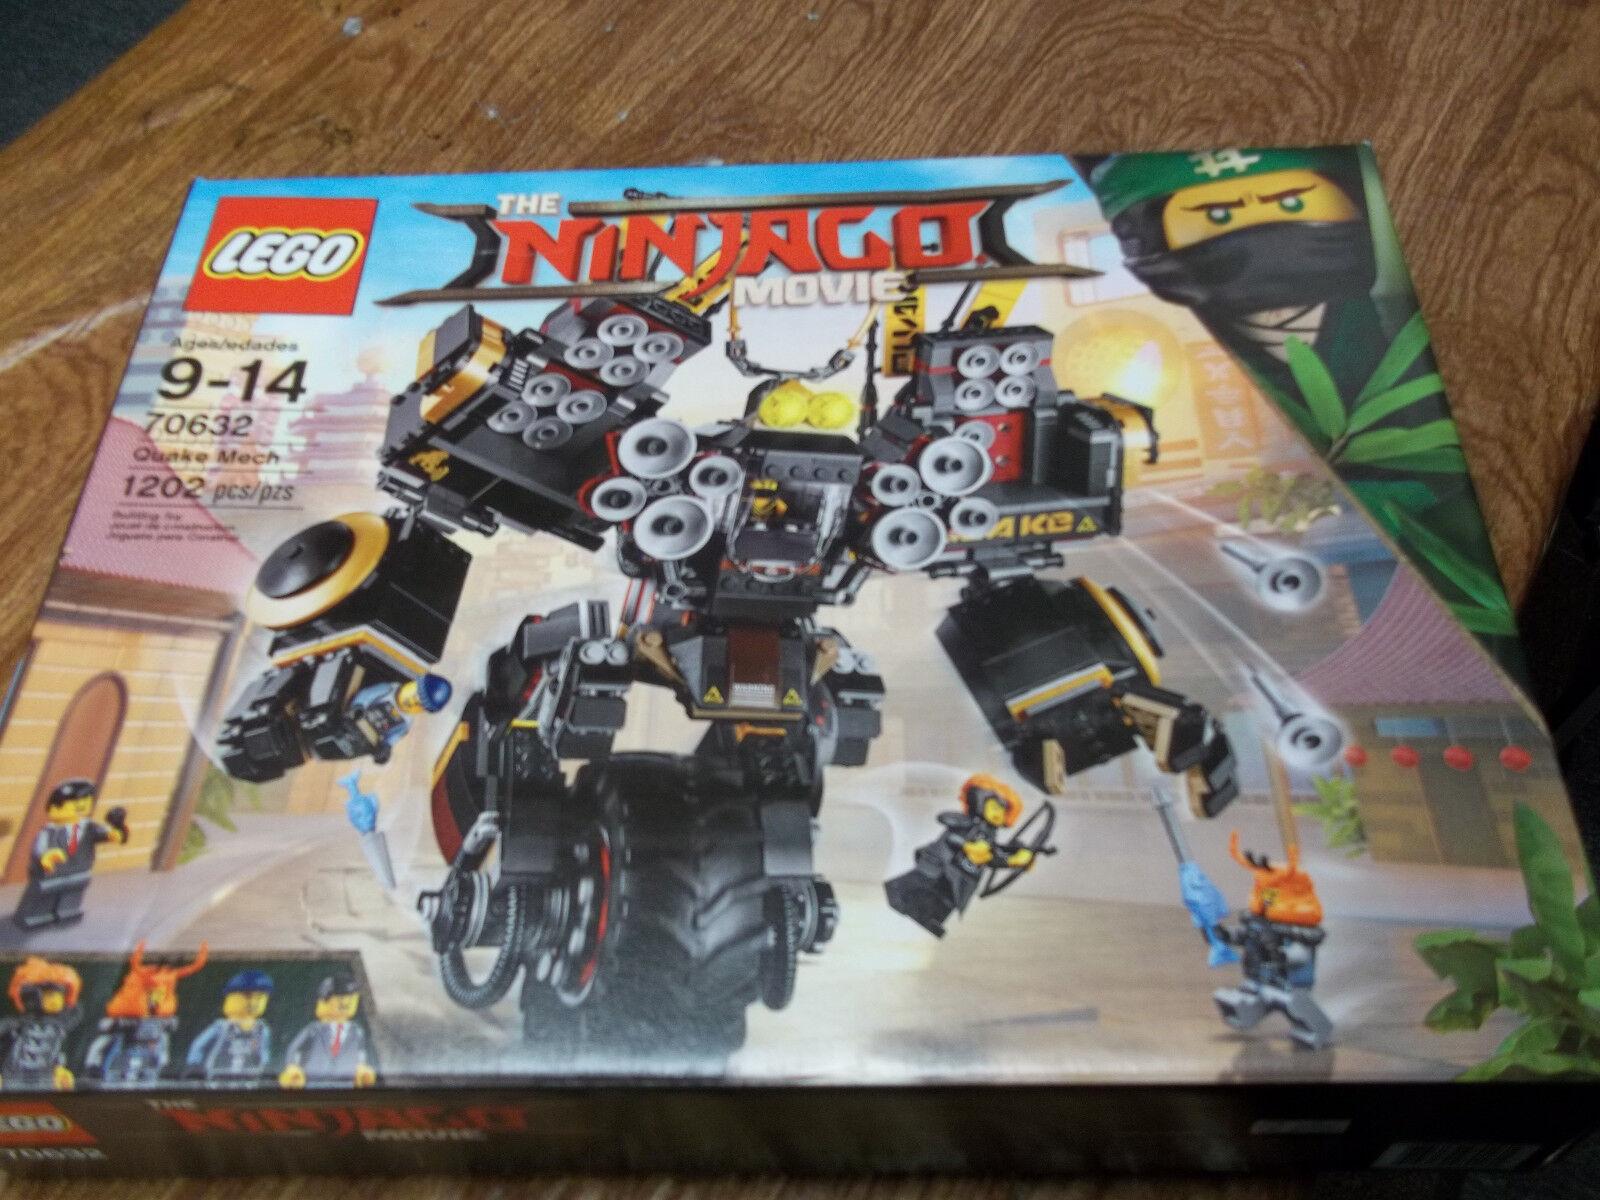 Lego The Ninjago Movie Quake Mech 70632 1202 PCS  NEW